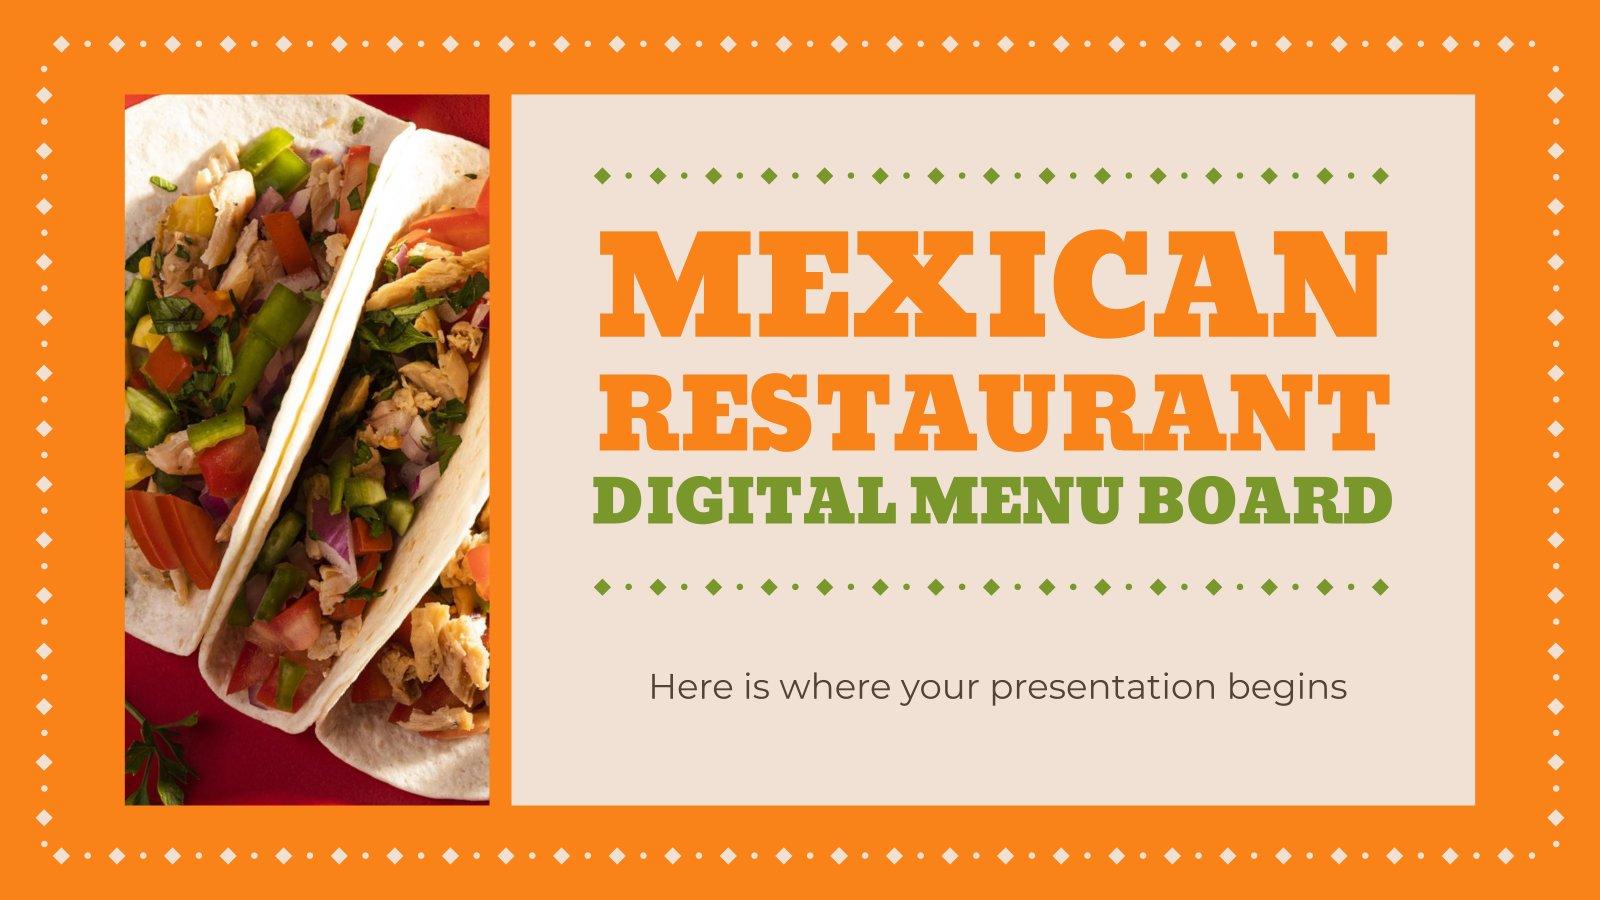 Mexican Restaurant Digital Menu Board presentation template